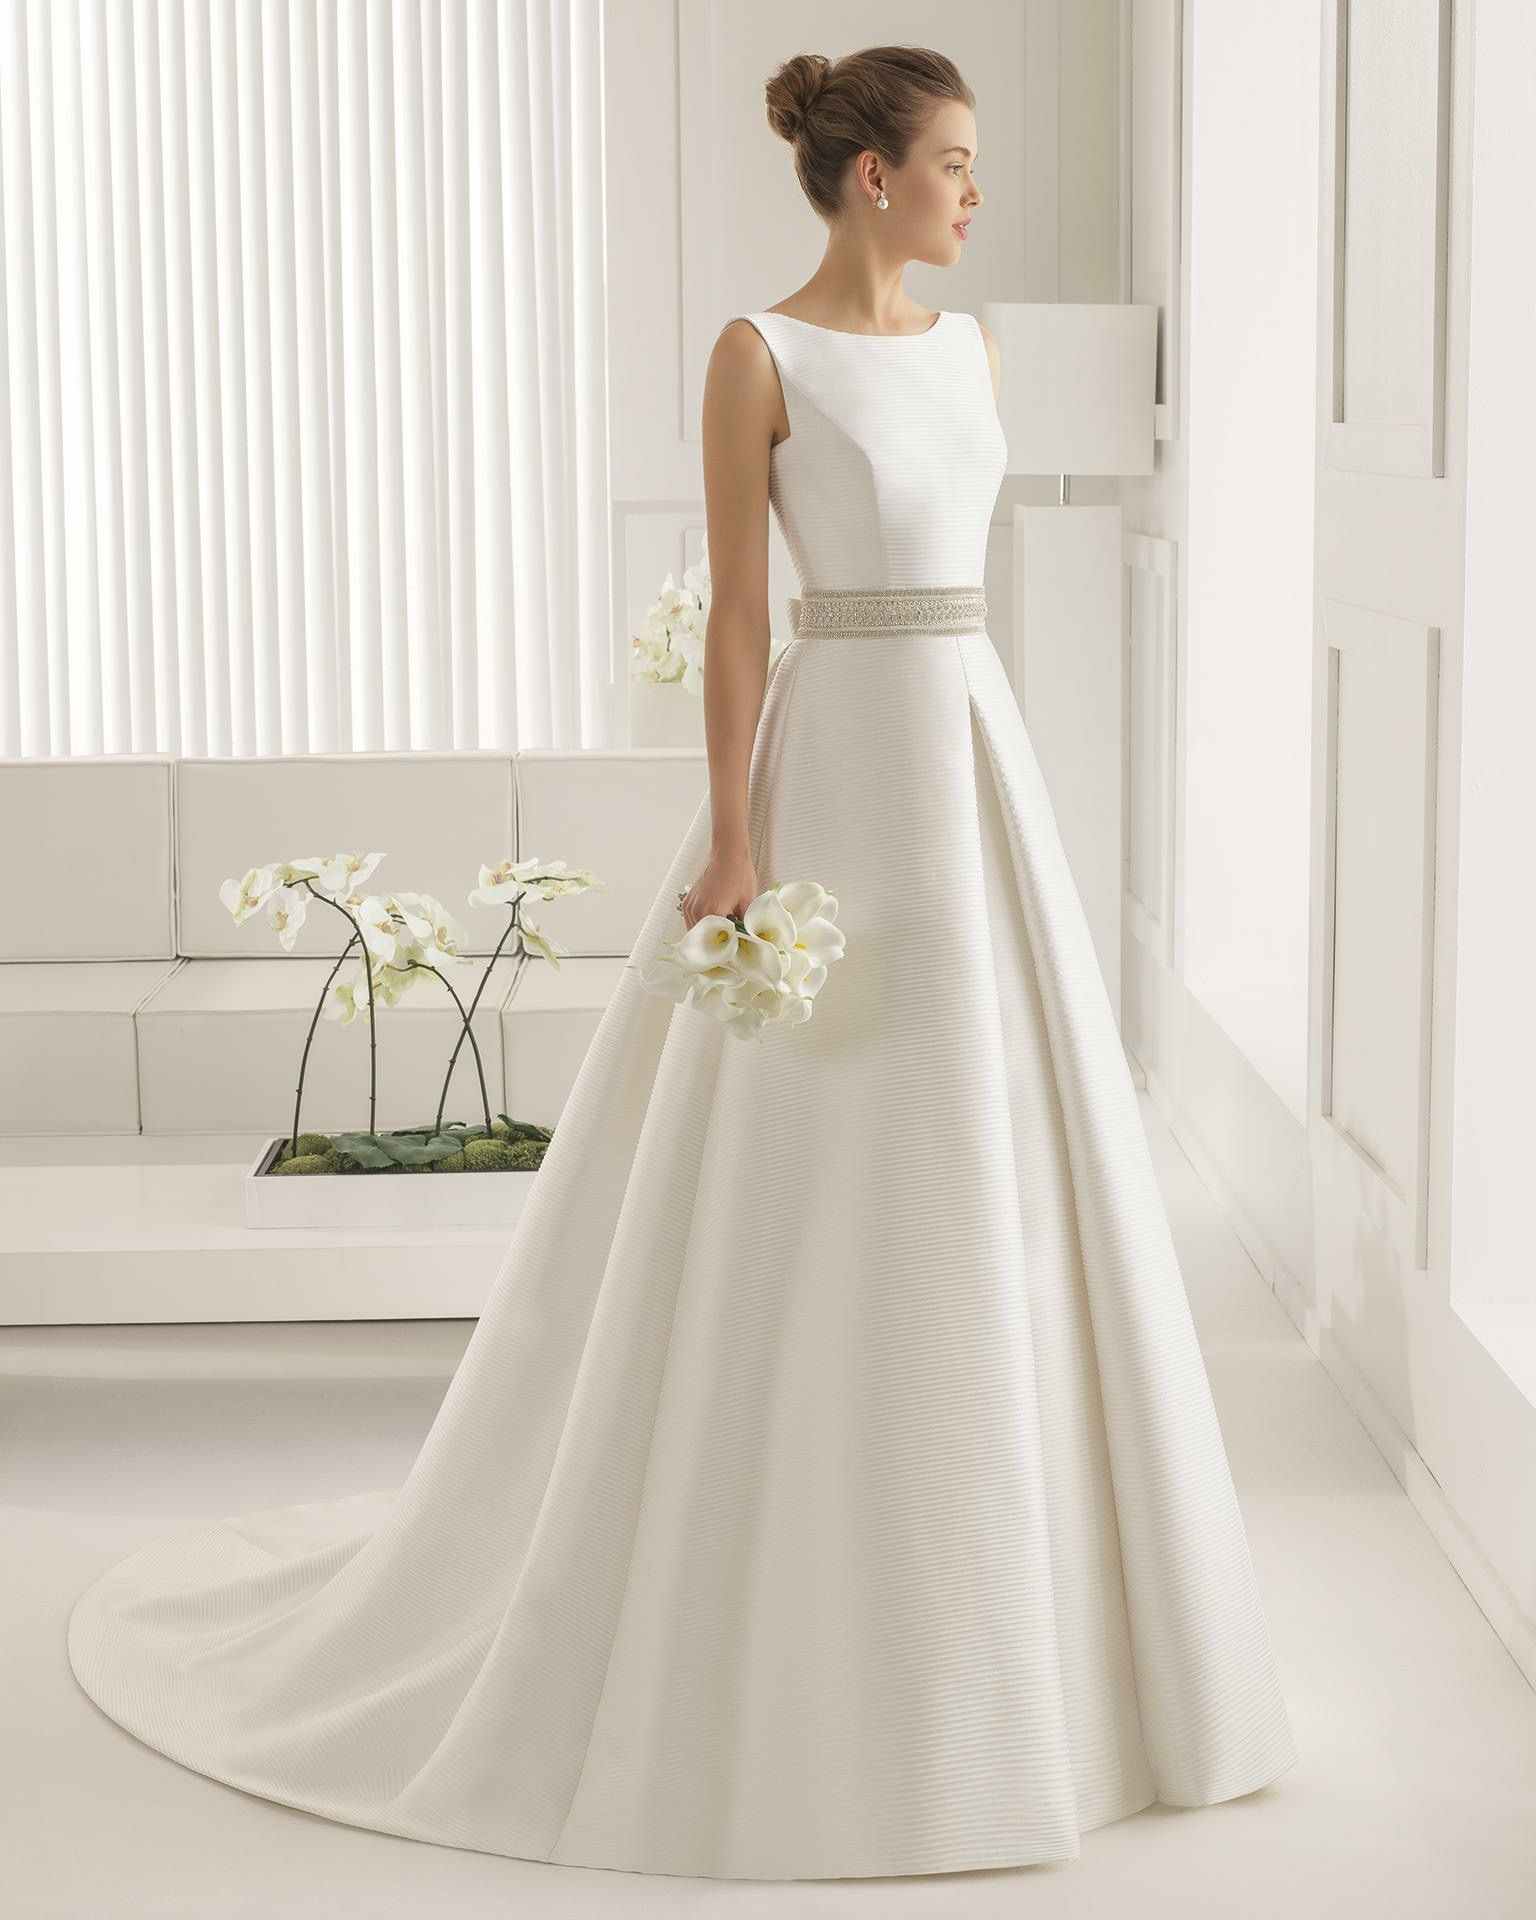 Womens dresses wedding guest  Elegant Simple Wedding Dress  Womenus Dresses for Wedding Guest